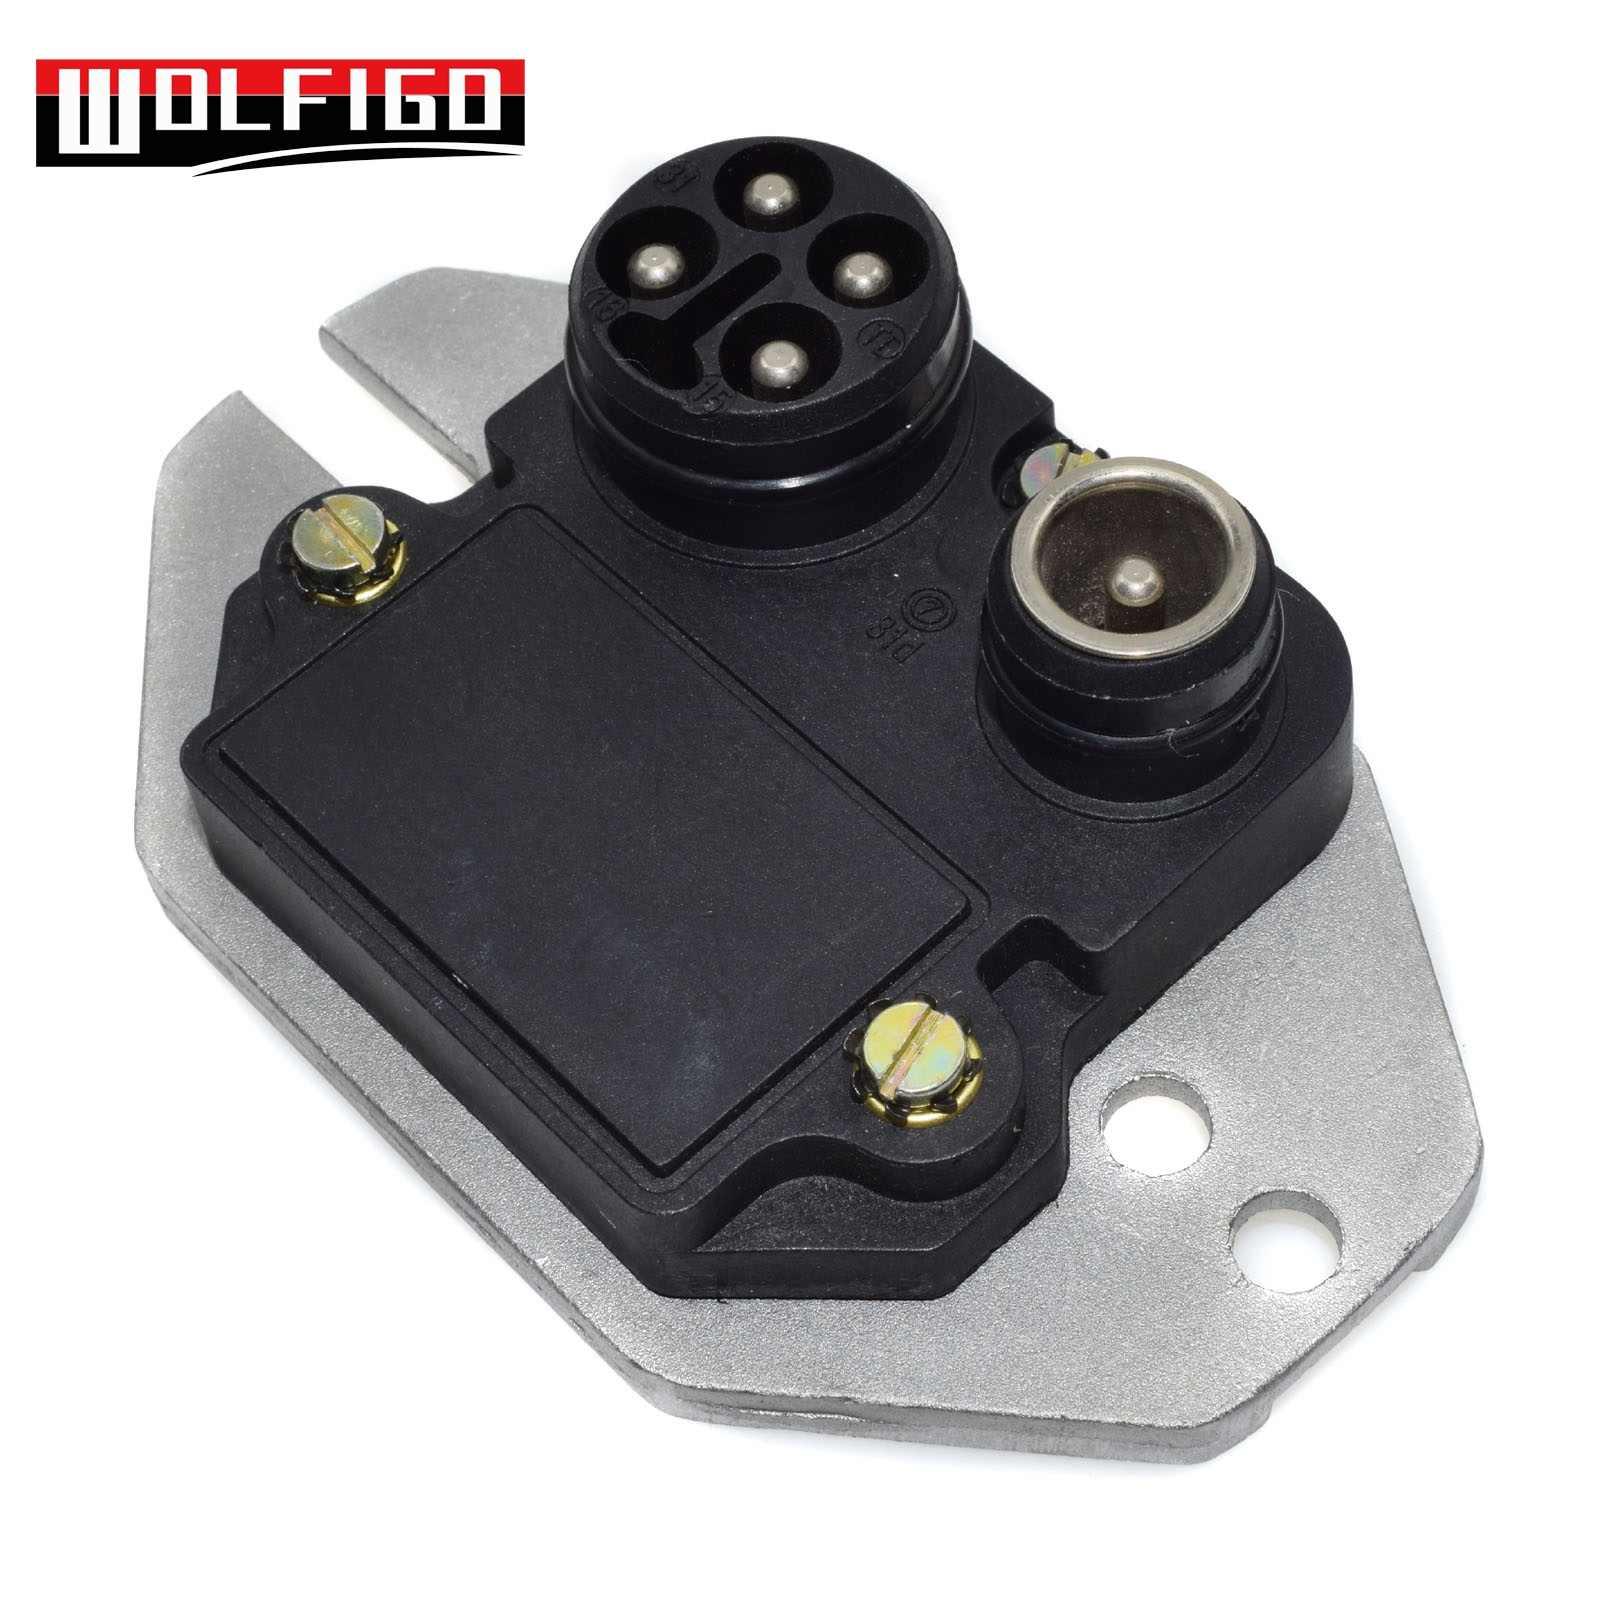 WOLFIGO Ignition Control Module For Mercedes 190E R107 W126 W201  0025452632H 0025452632 NEW